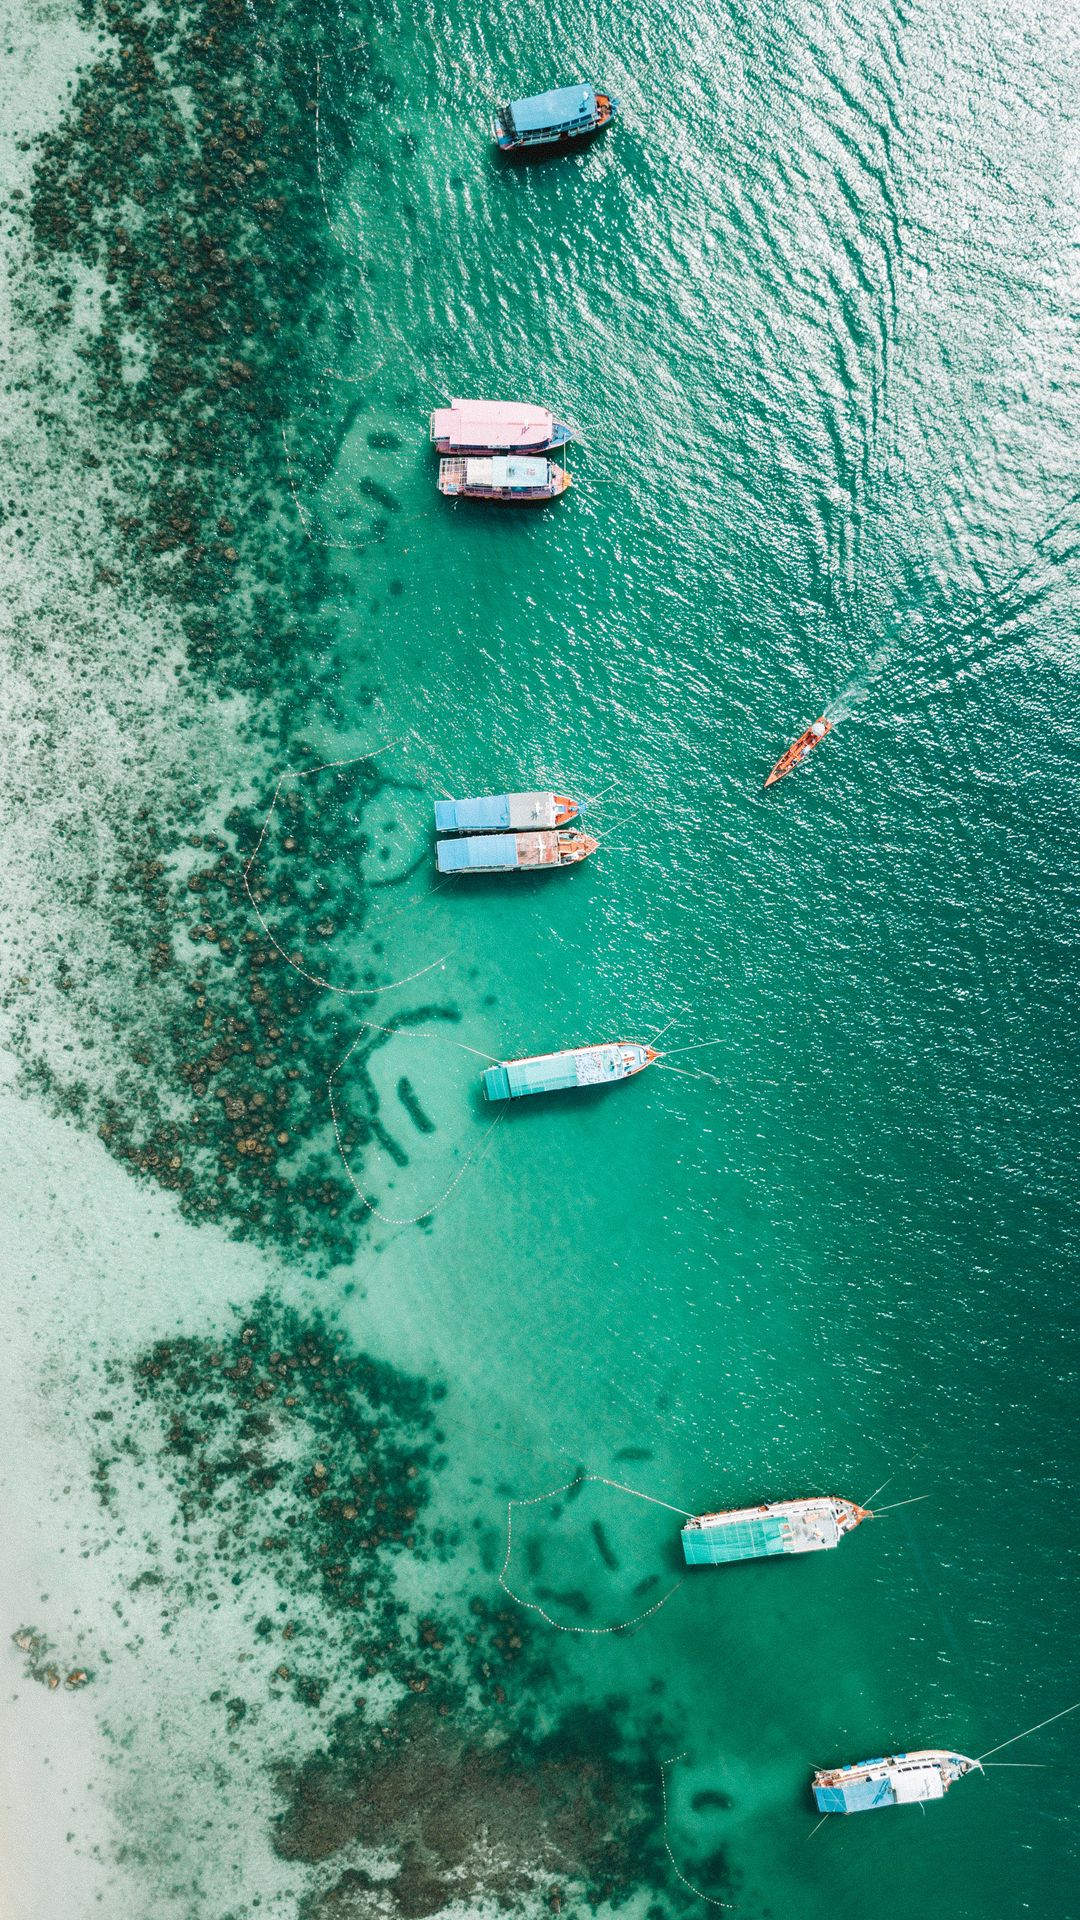 1080x1920 Wallpaper shore, boats, sandbar, ocean, moored, aerial view